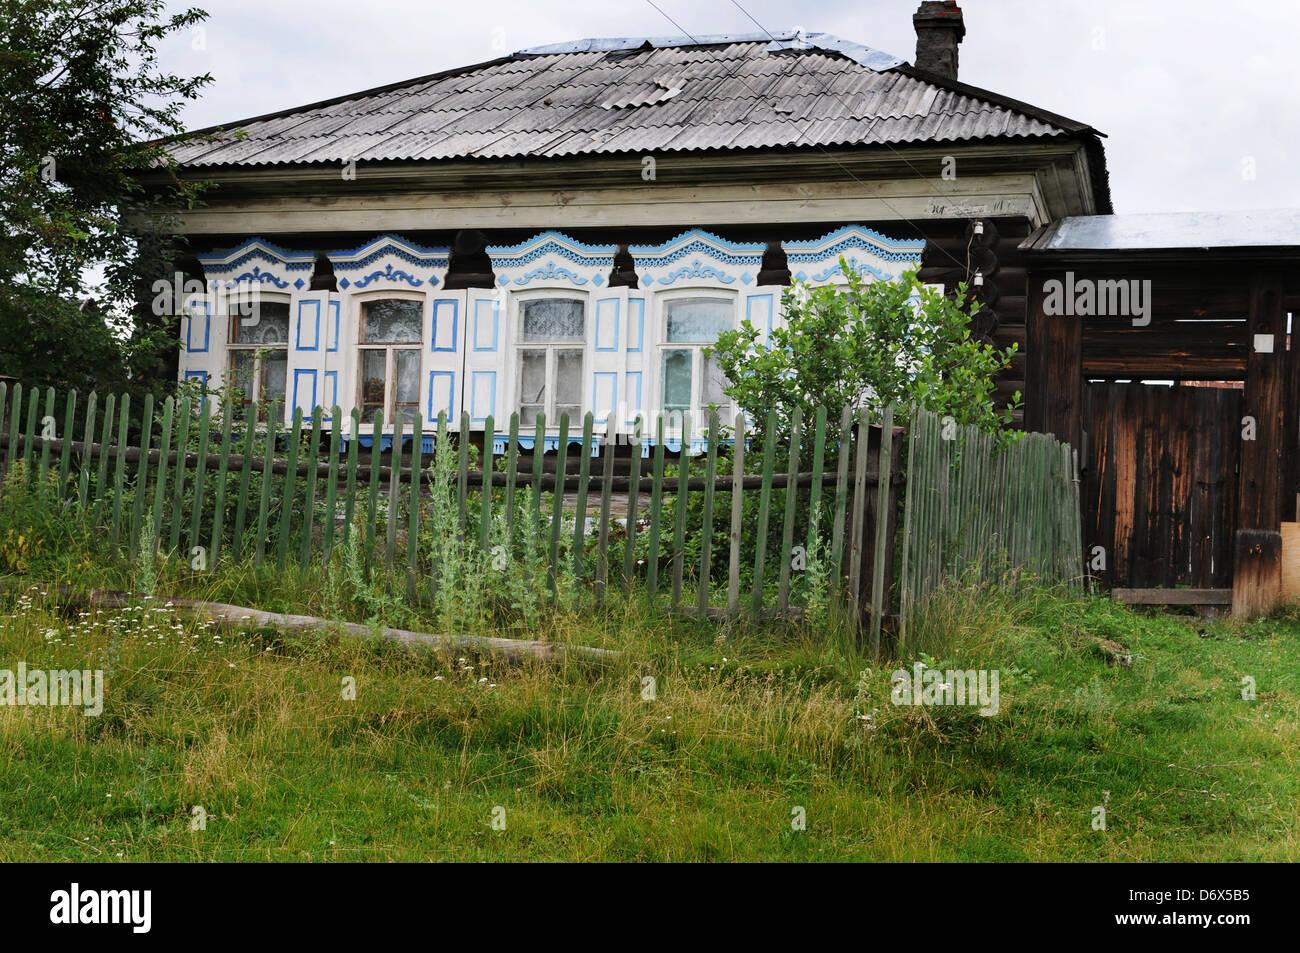 Casette Russe Di Campagna casa russa immagini e fotos stock - alamy